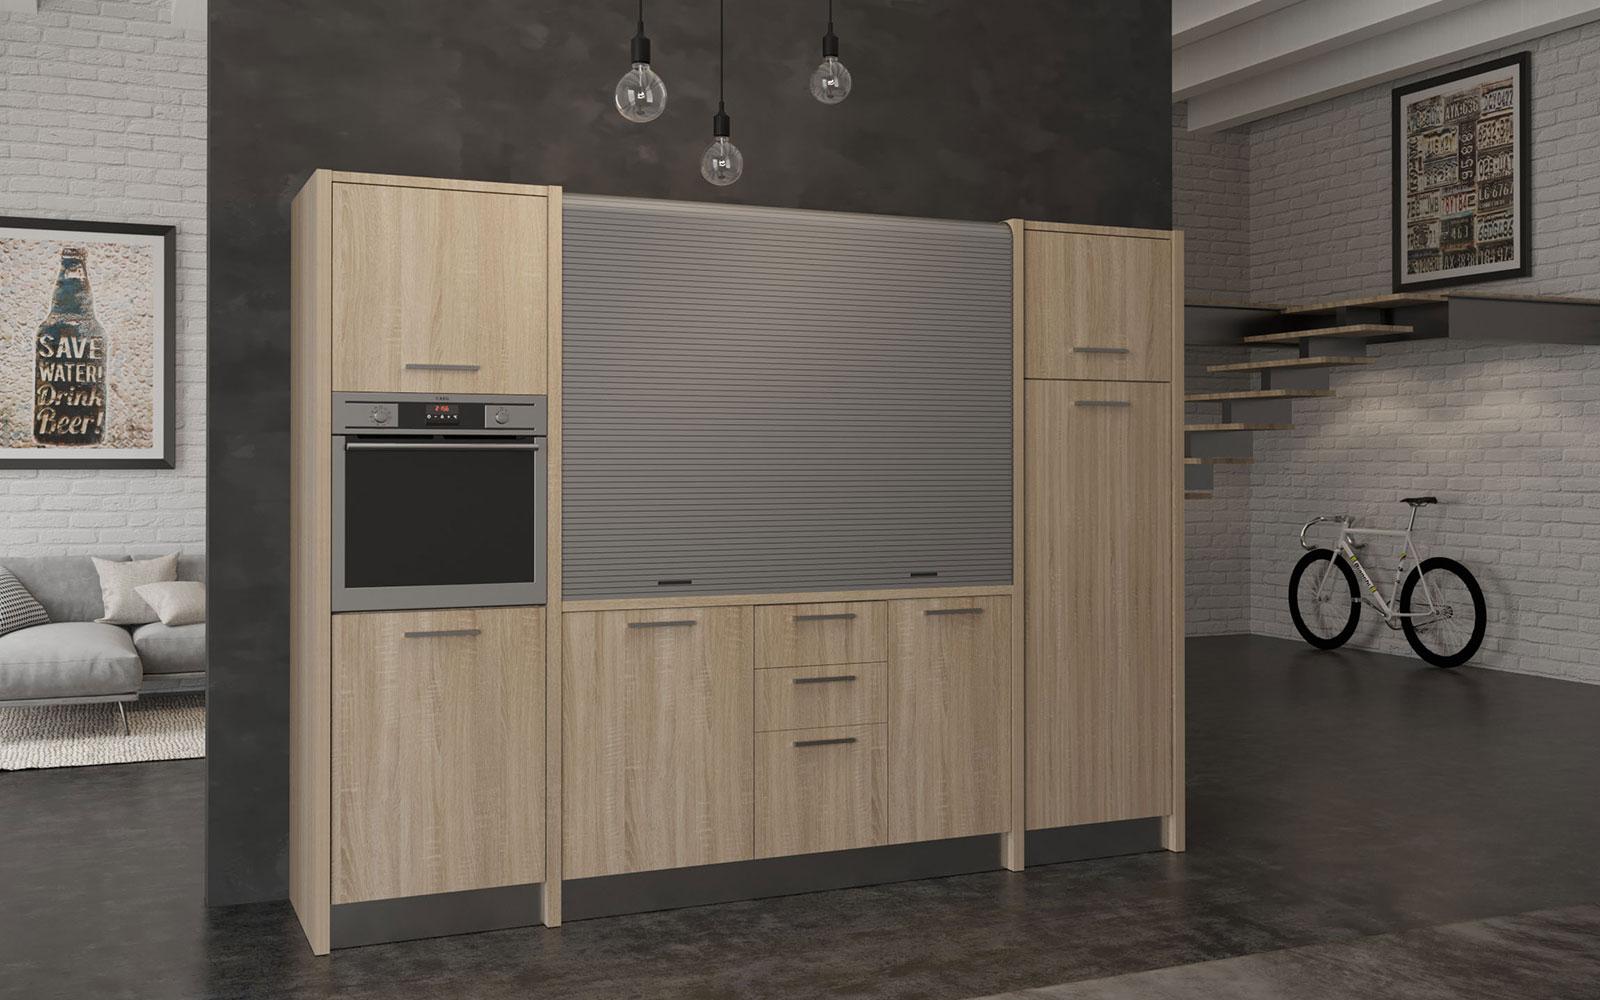 Cucine trasformabili, perché sceglierle per i mini appartamenti